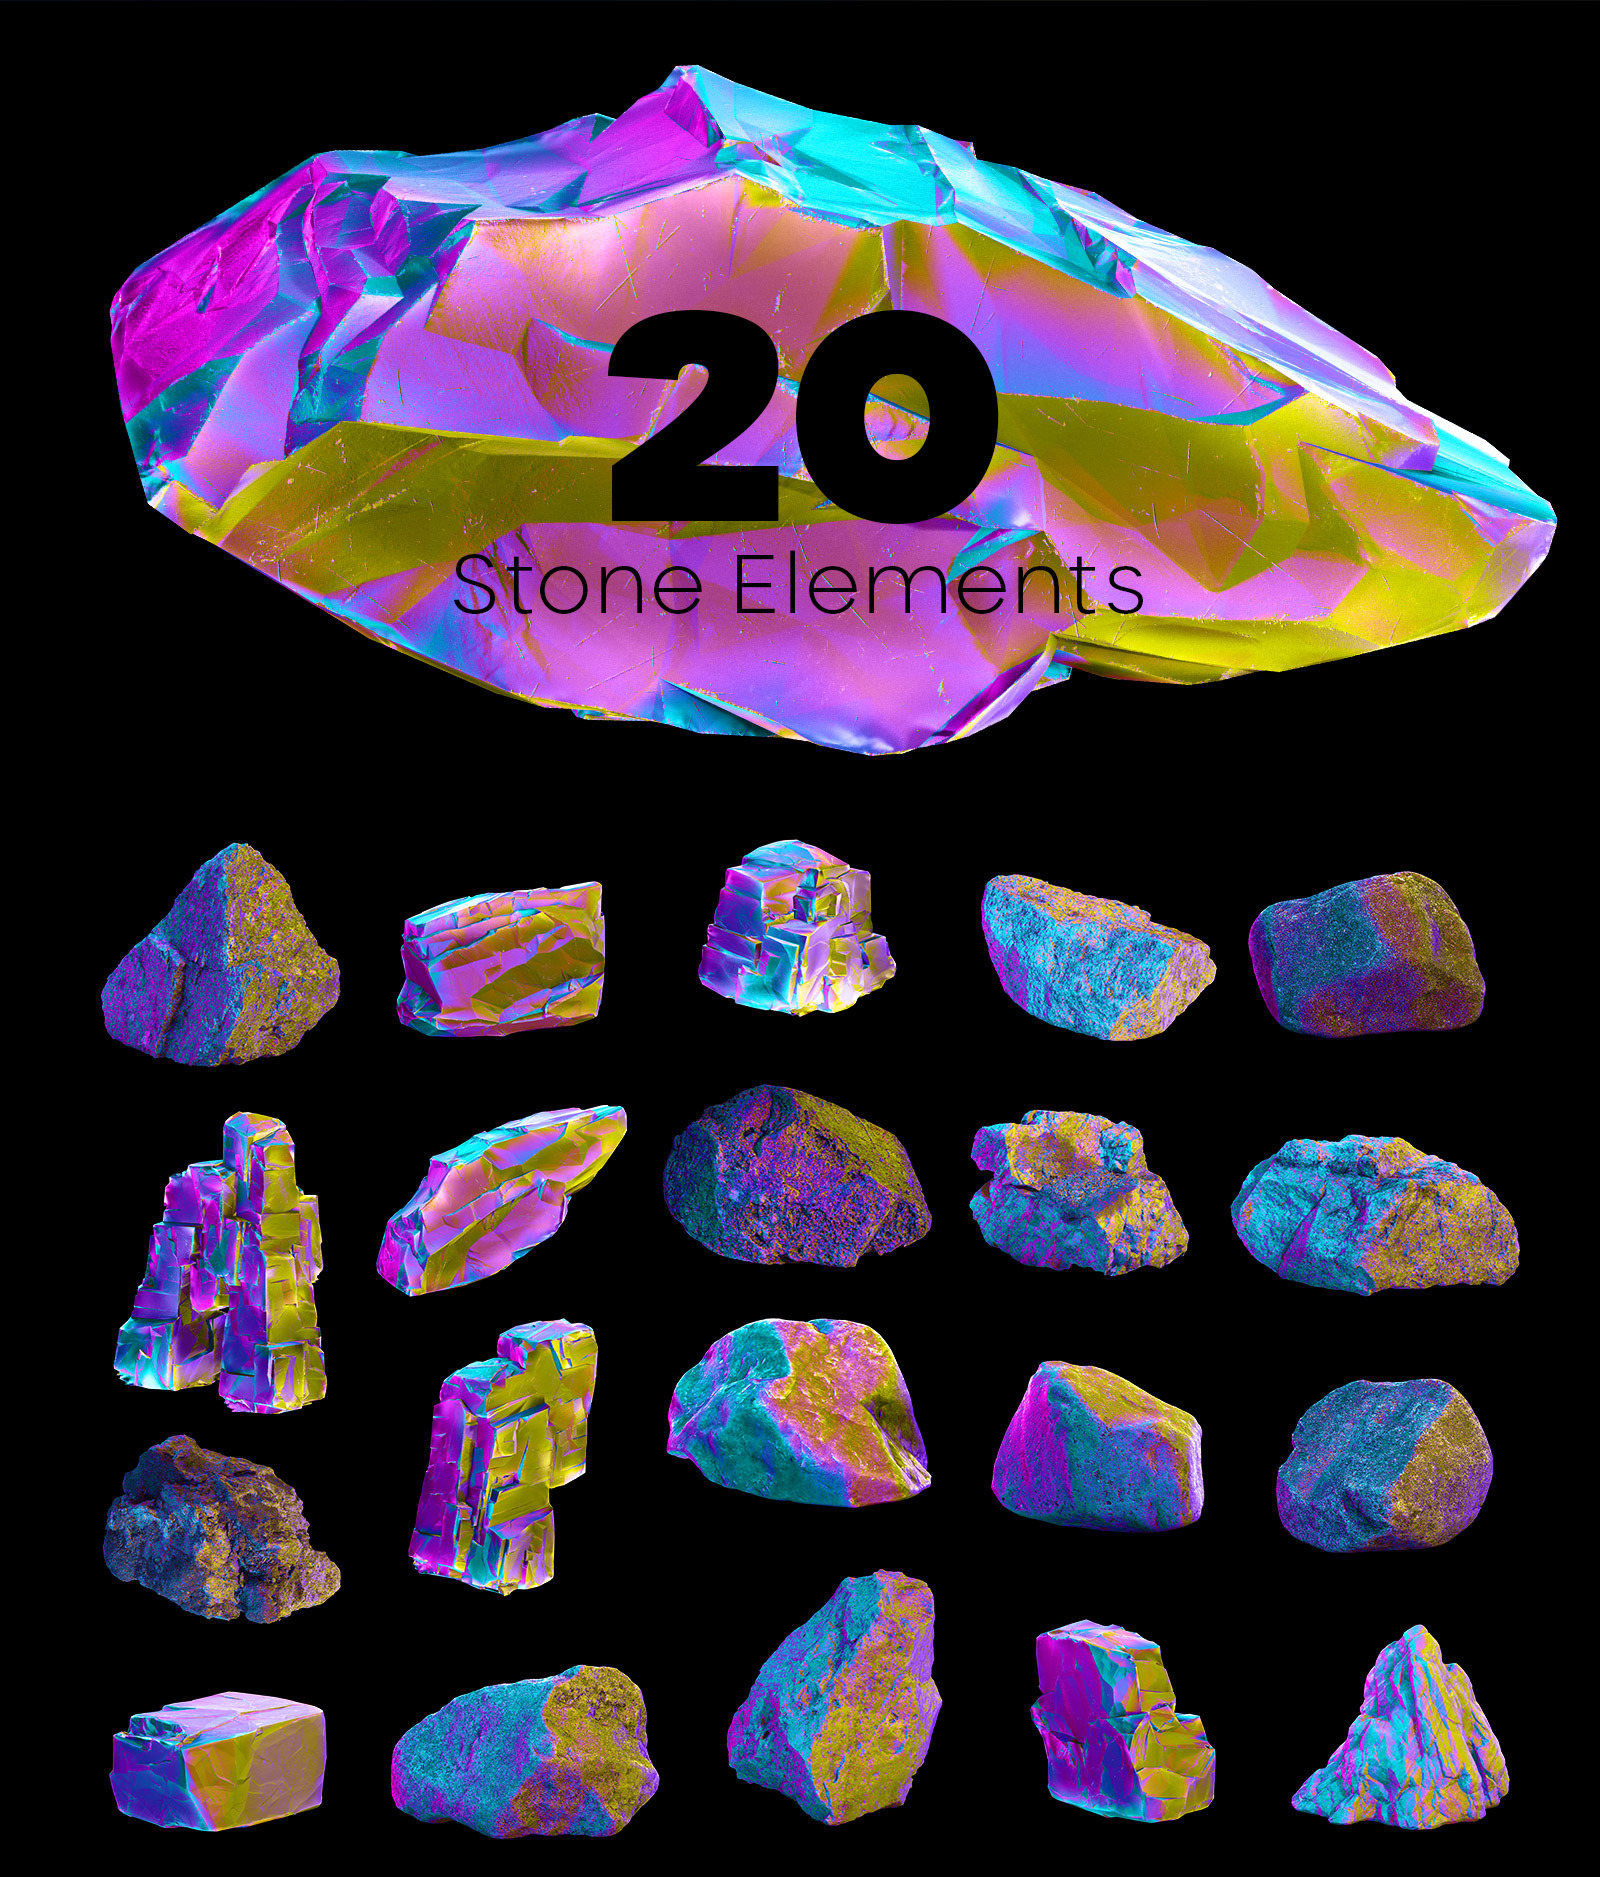 MULTICOLOR plants & stones collection #05